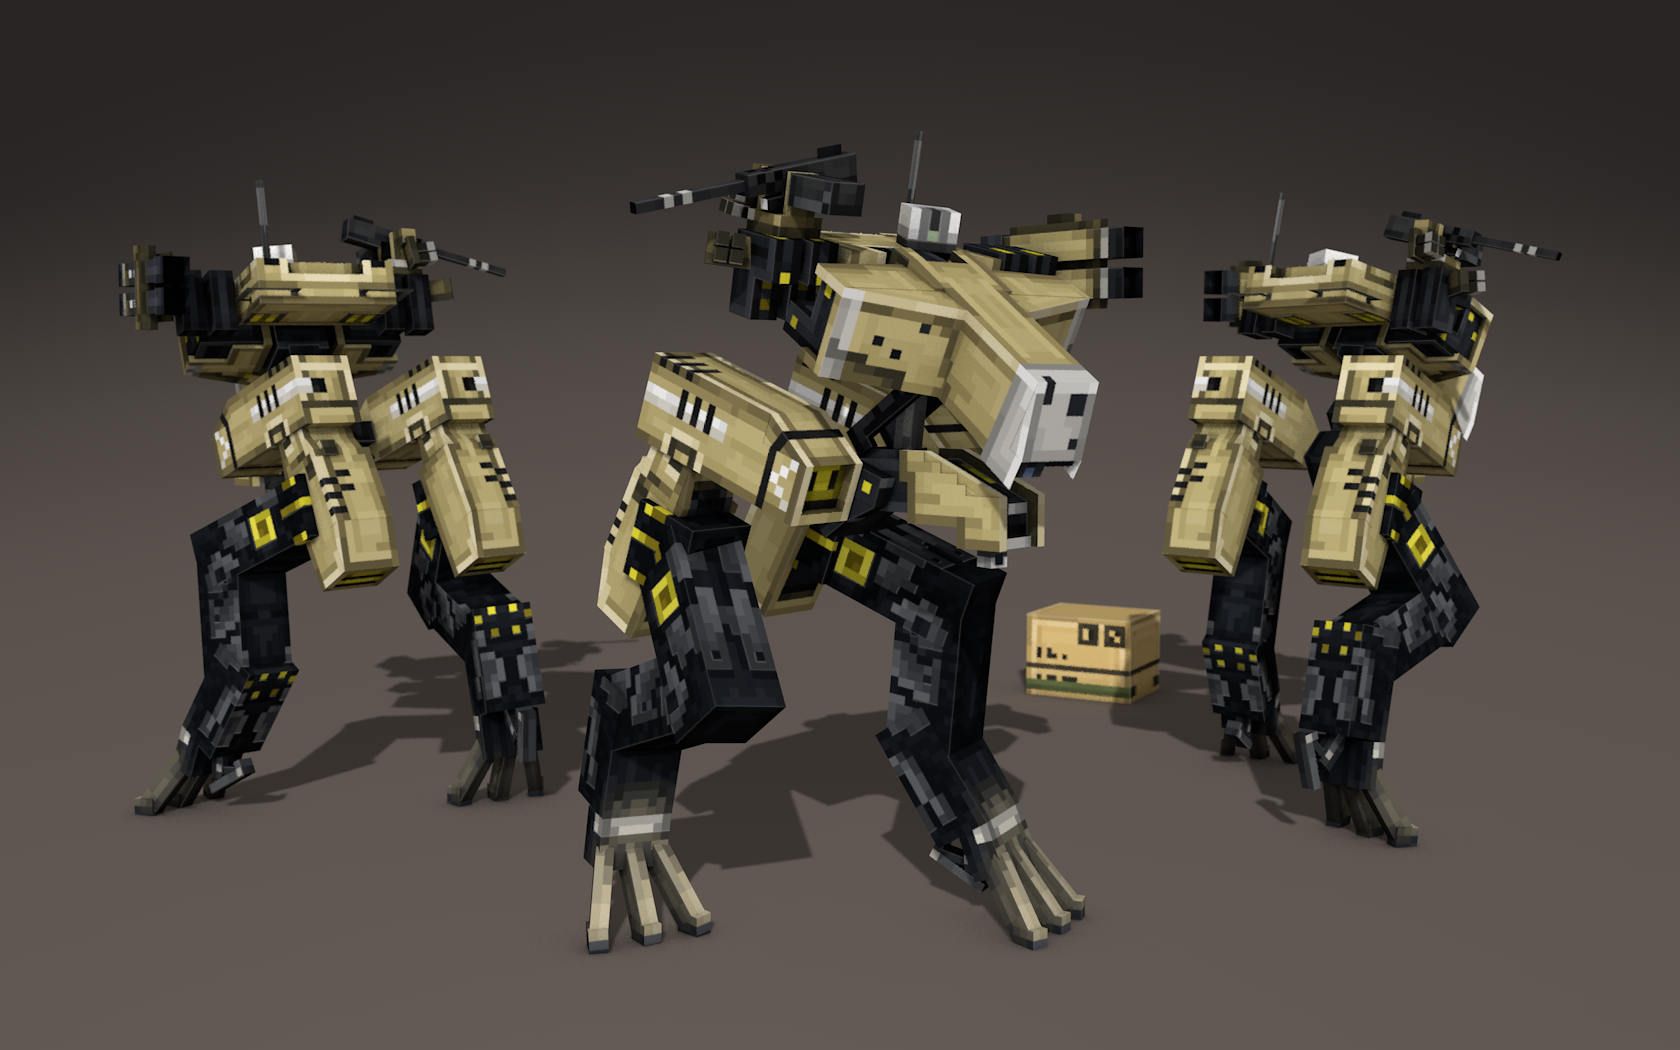 Metal Gear solid 4 - Gecko